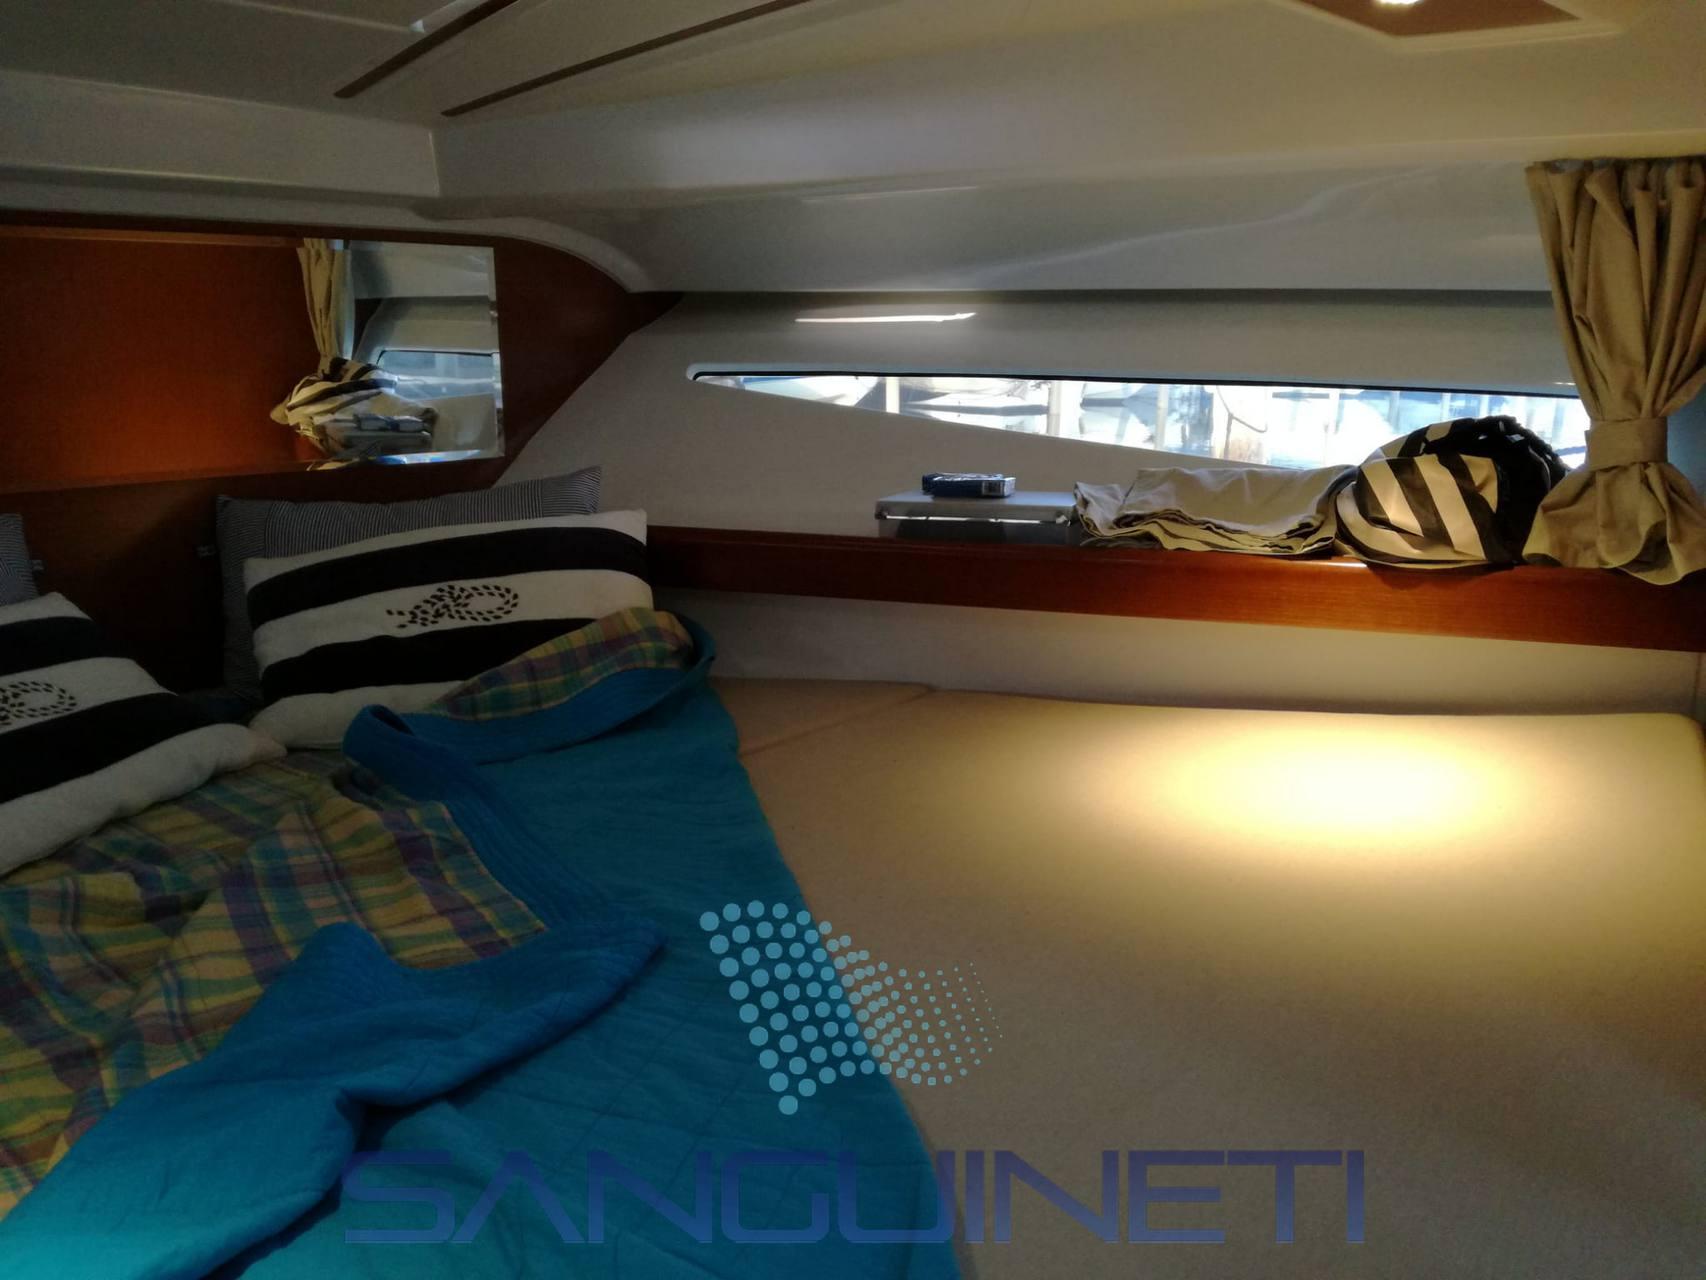 Beneteau Antares 880 motor boat